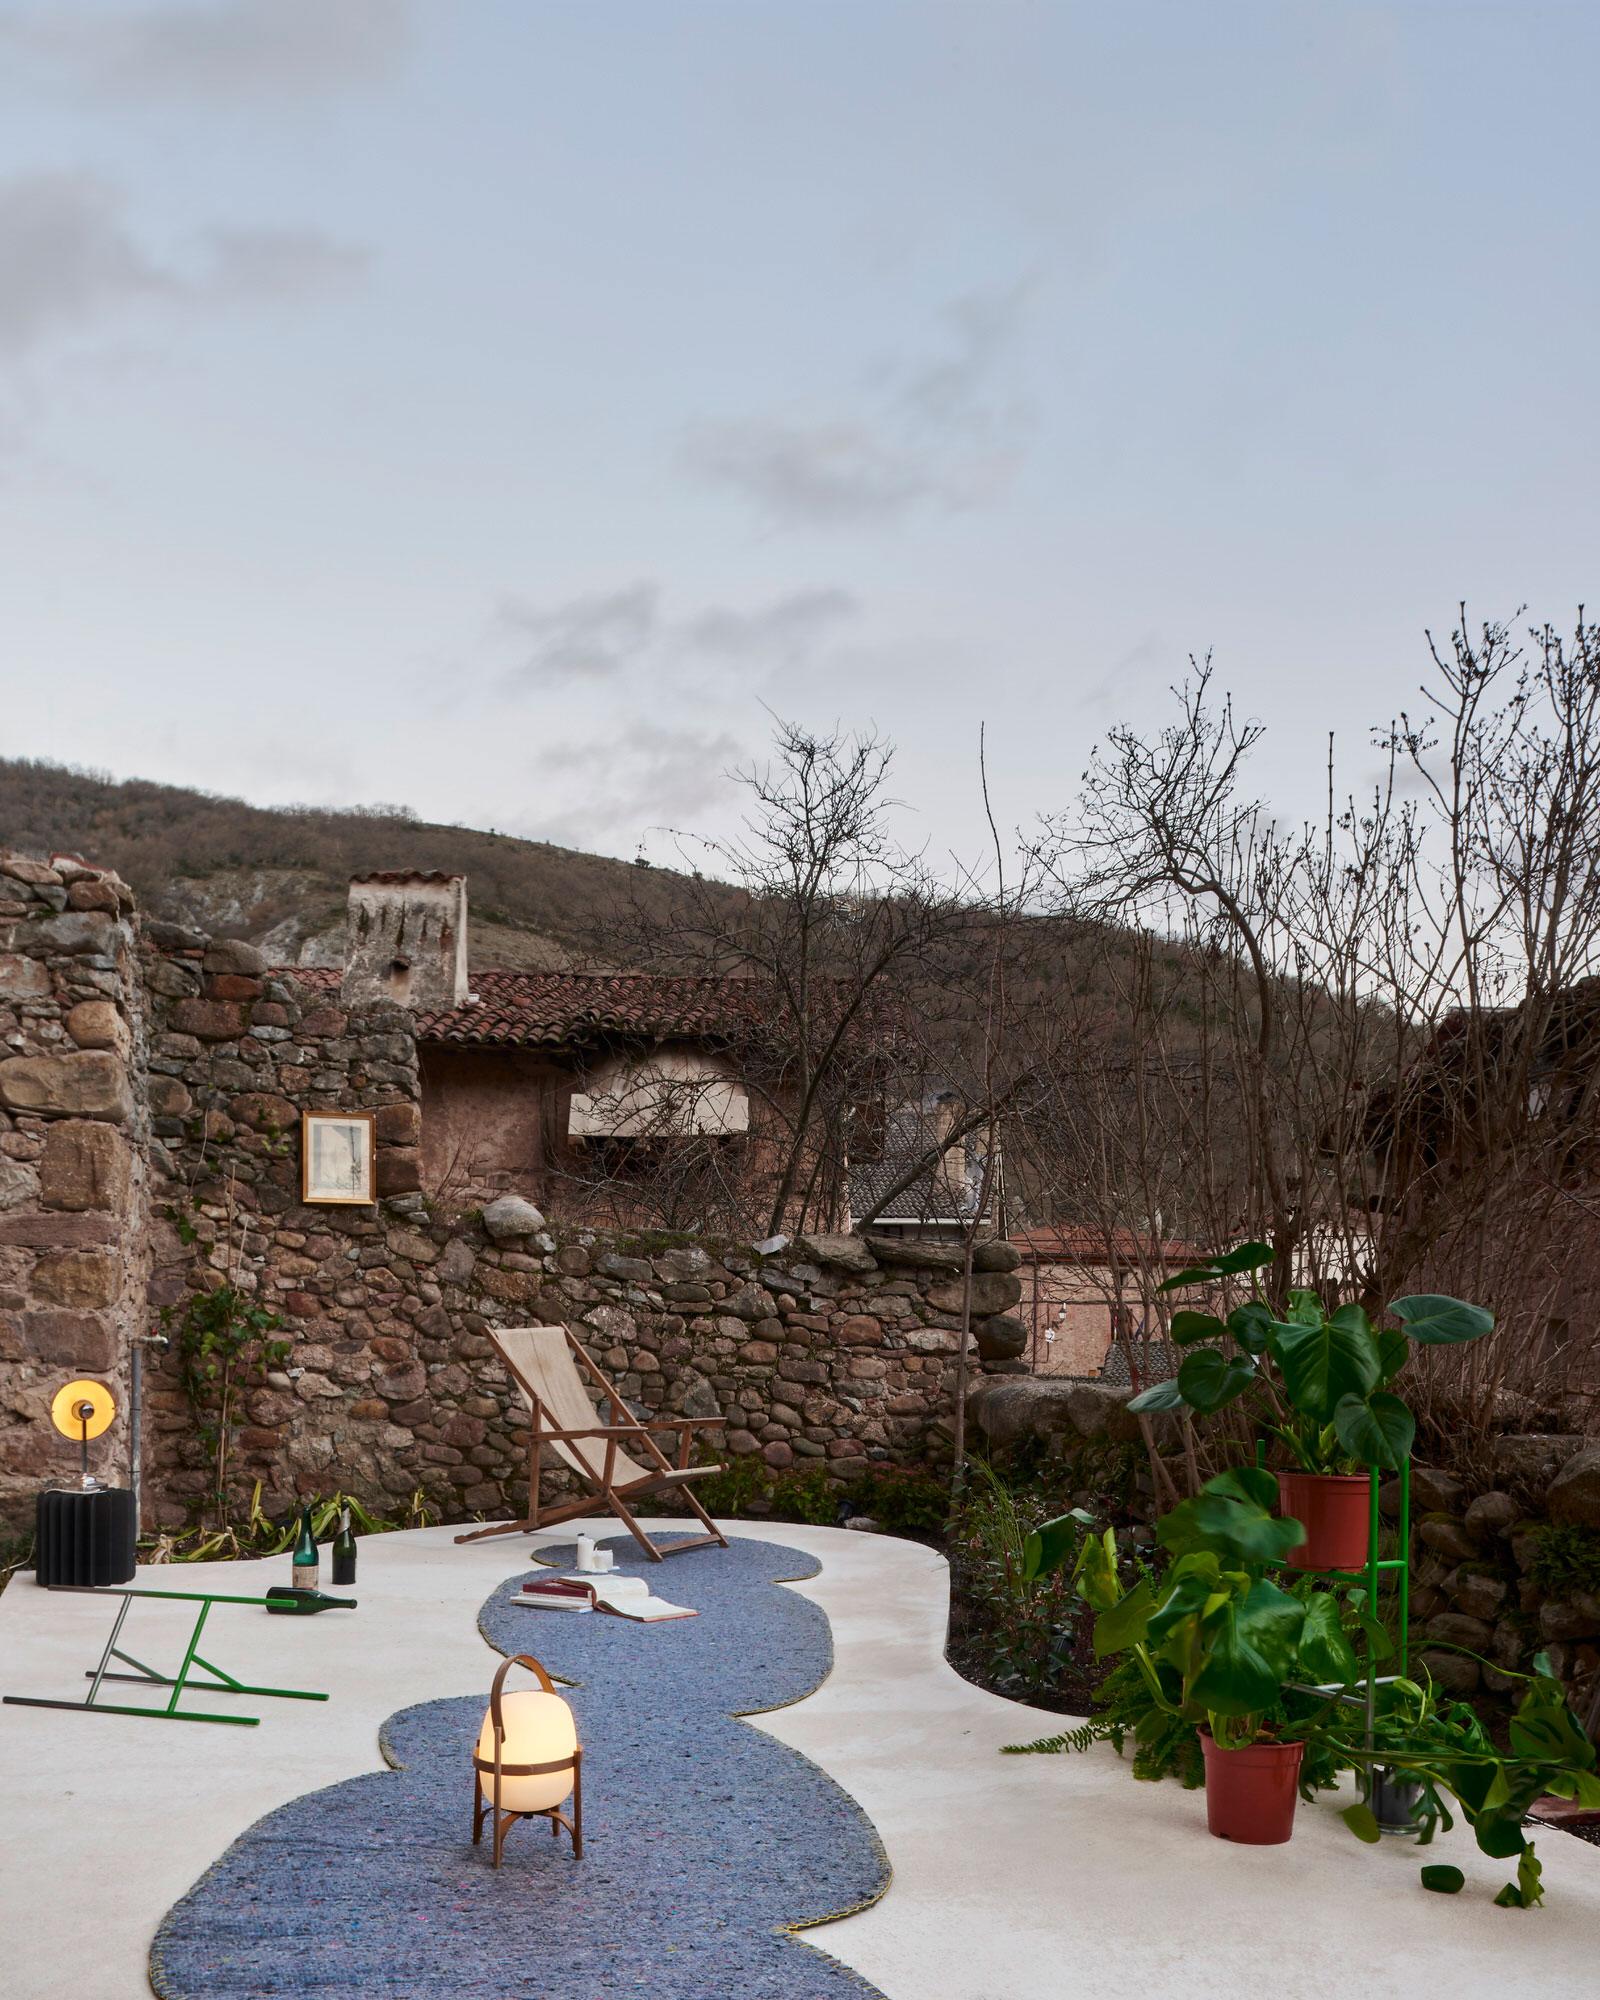 Hanghar Garden House La Rioja Spain Experimental Architecture Photo Max Hart Nibbrig Yellowtrace 01